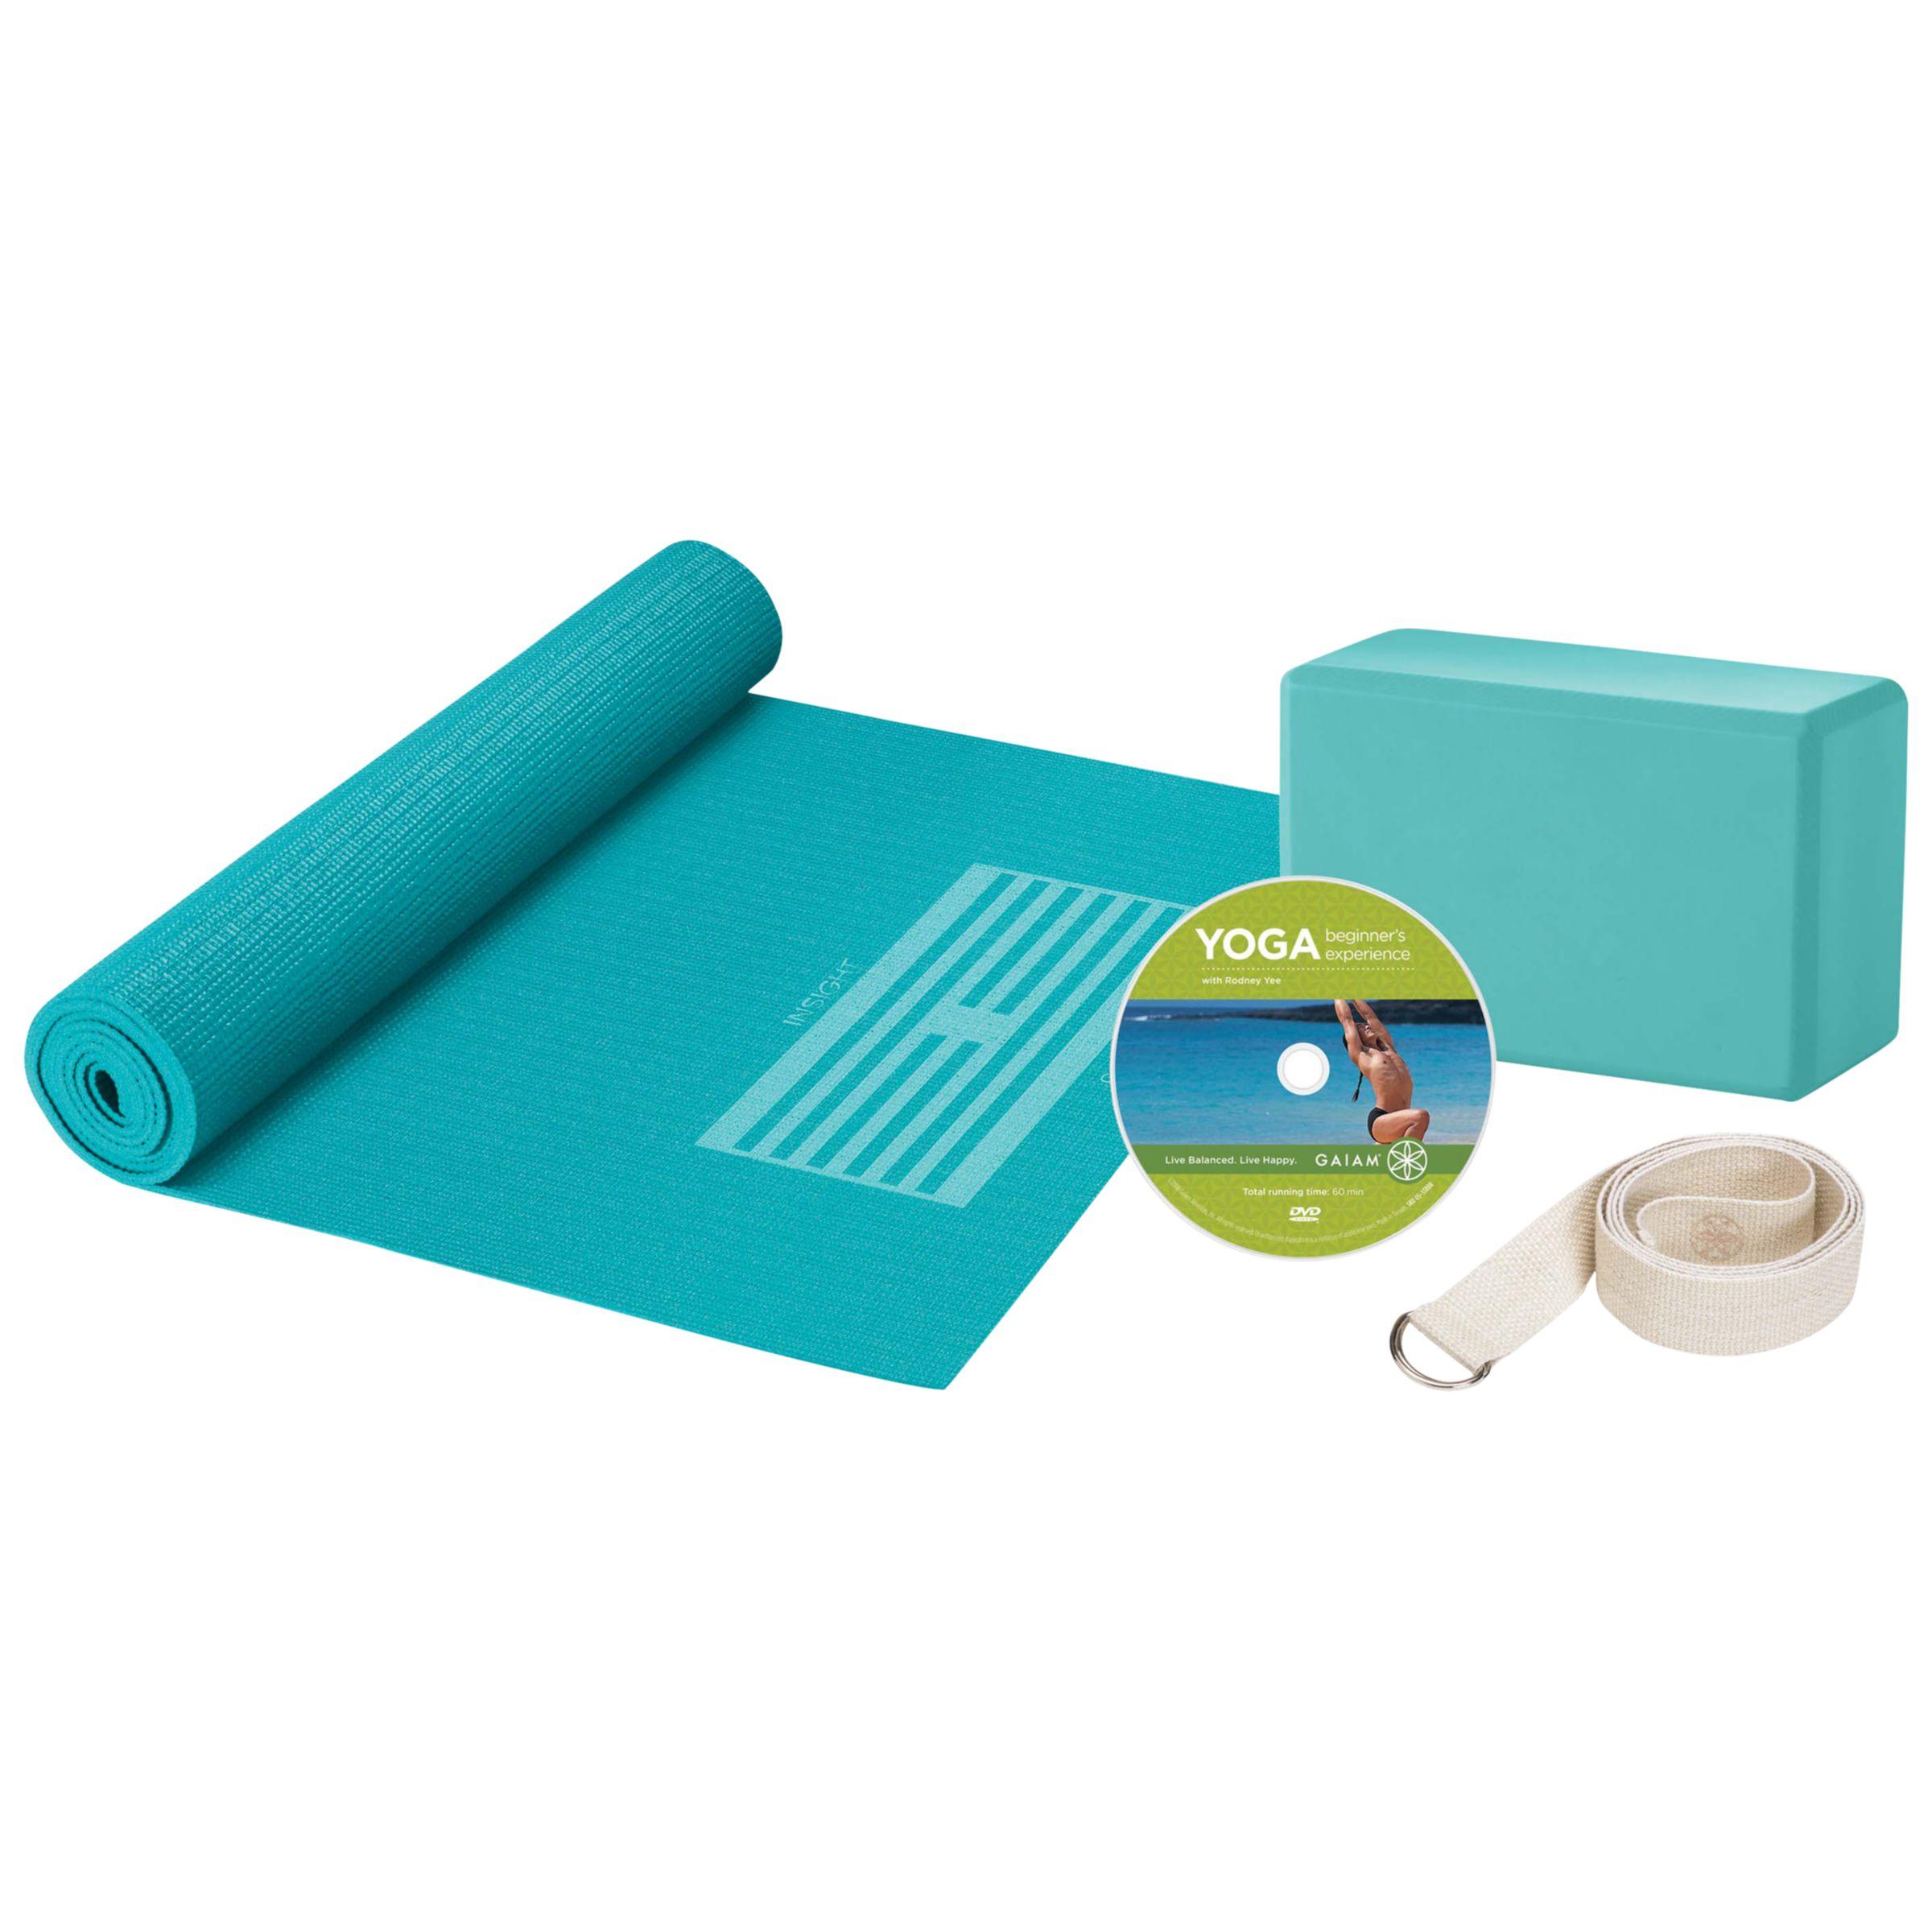 Gaiam Yoga Beginner's Kit